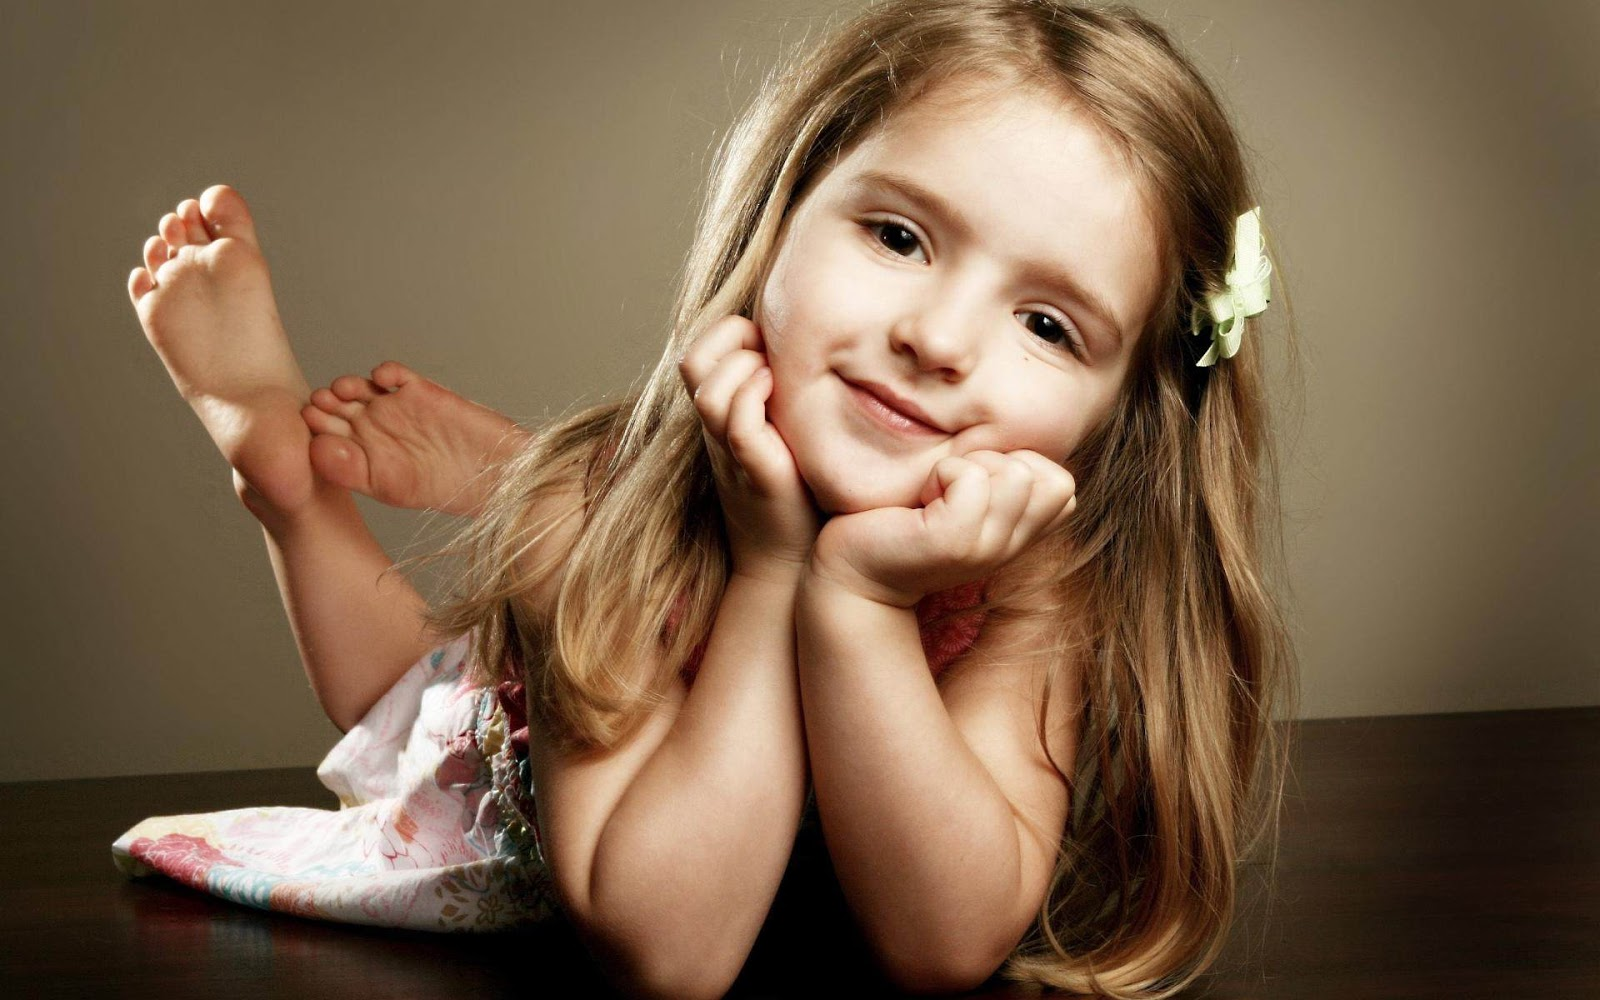 Cute Baby Girl Wallpaper hd ImageBankbiz 1600x1000